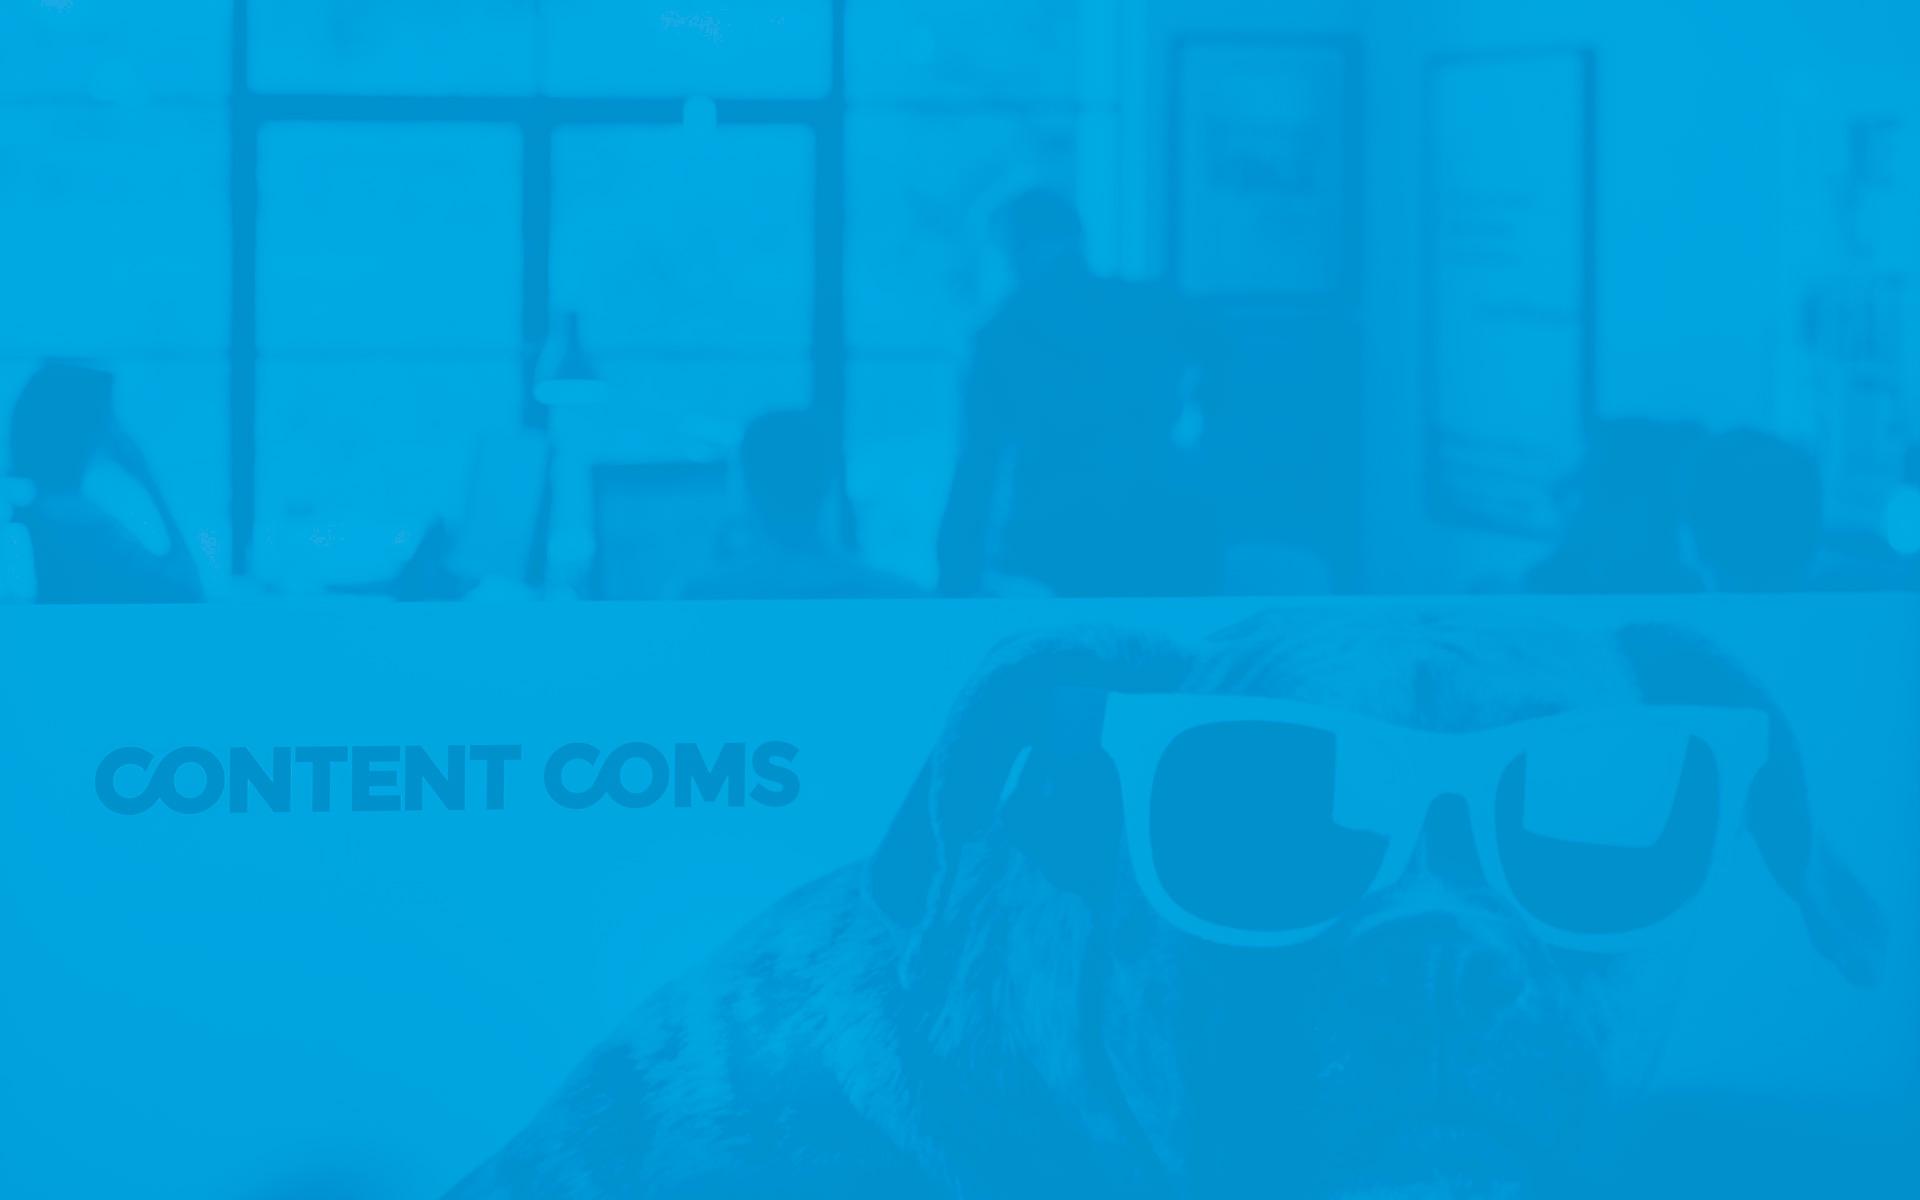 The <b>B2B communications consultancy</b>